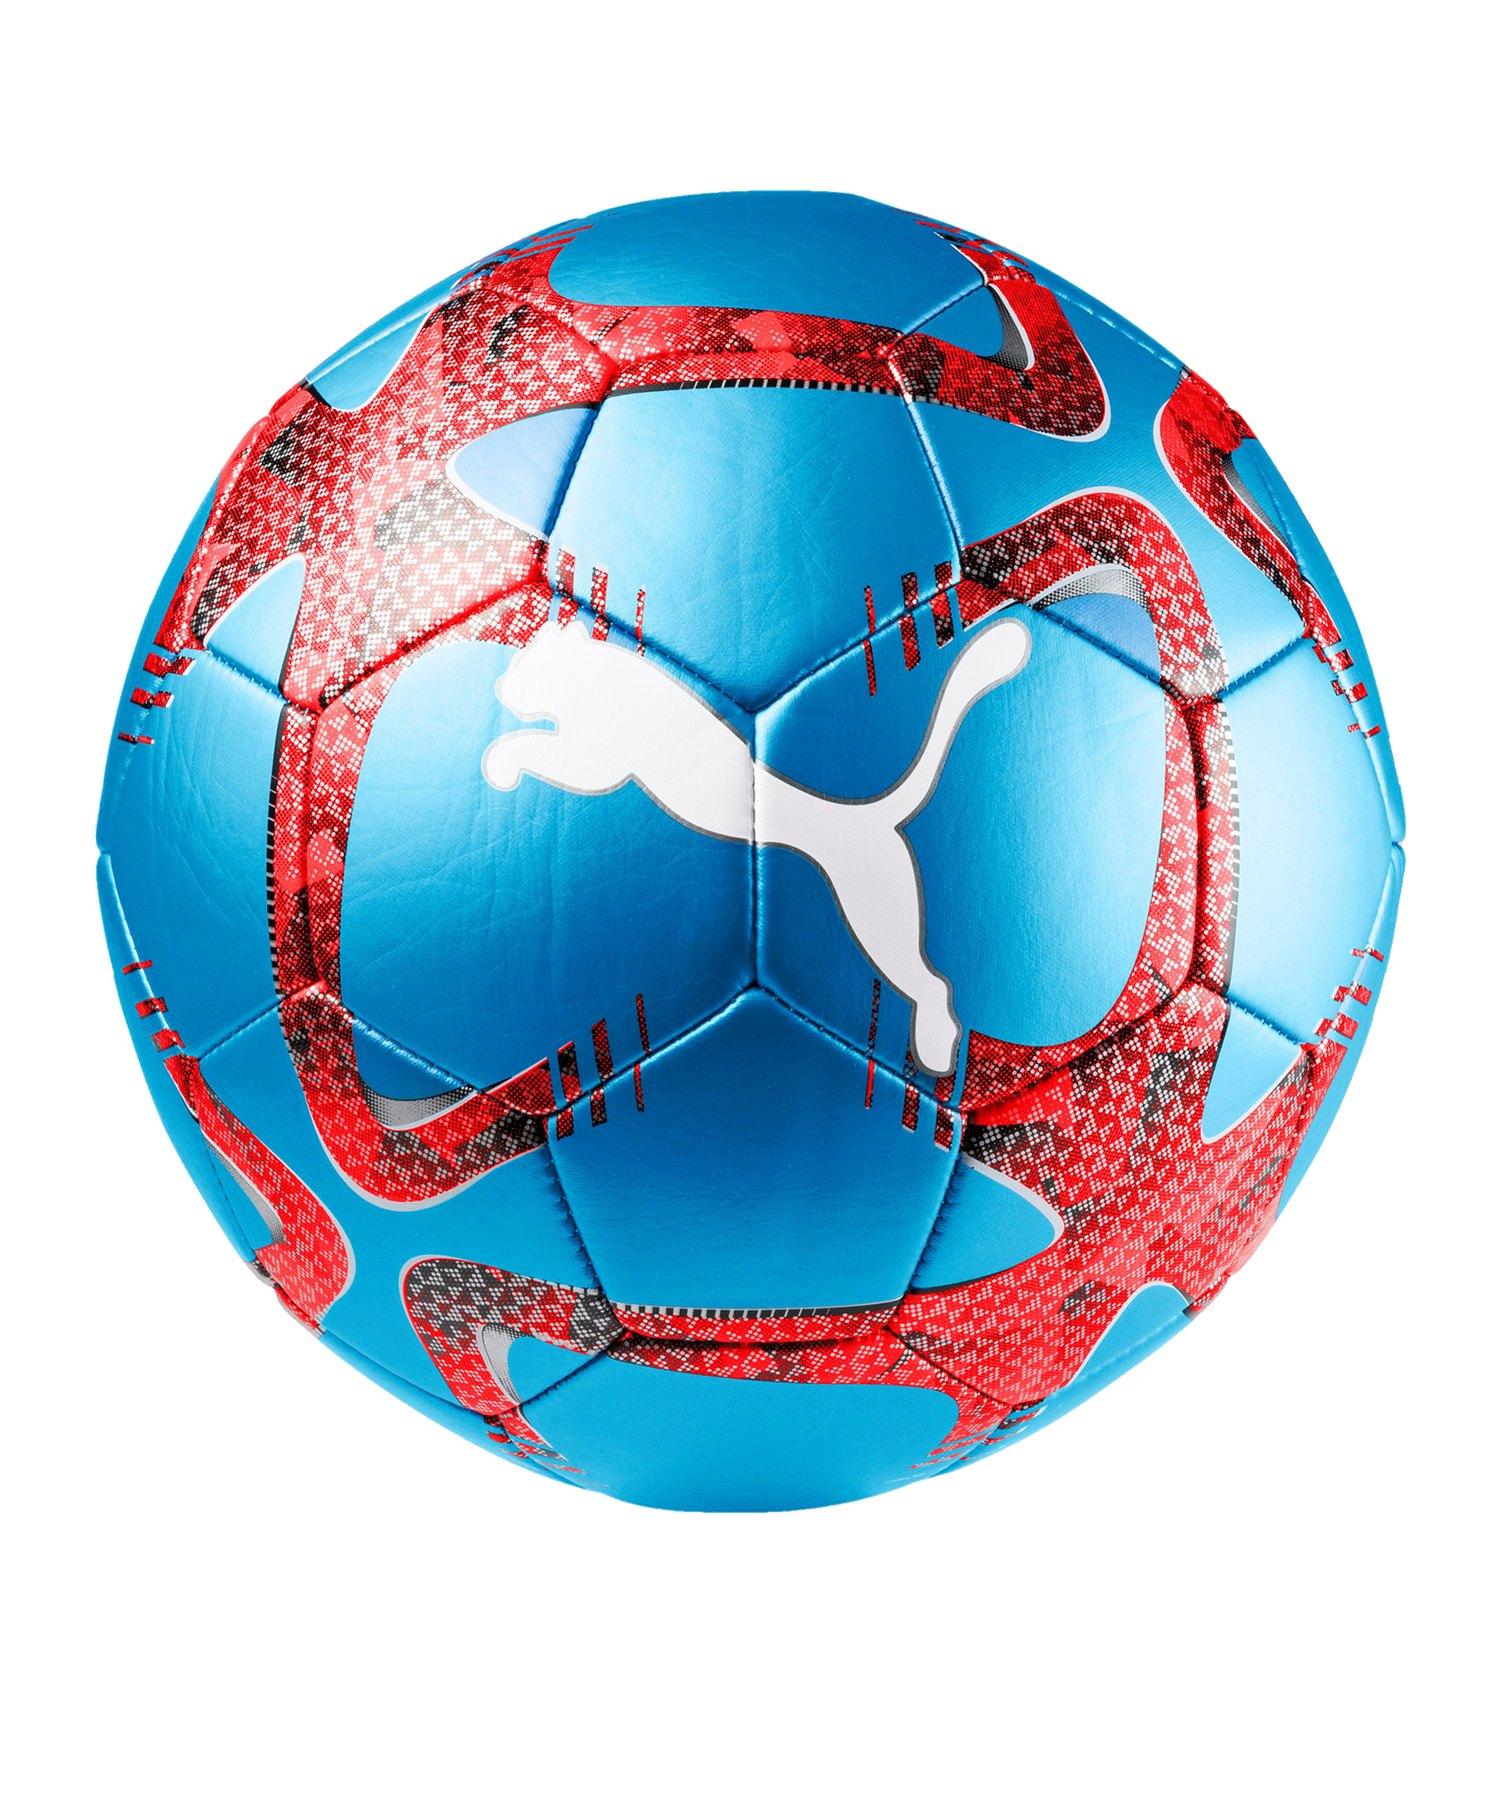 PUMA FUTURE Flash Trainingsball Blau Rot F02 - blau